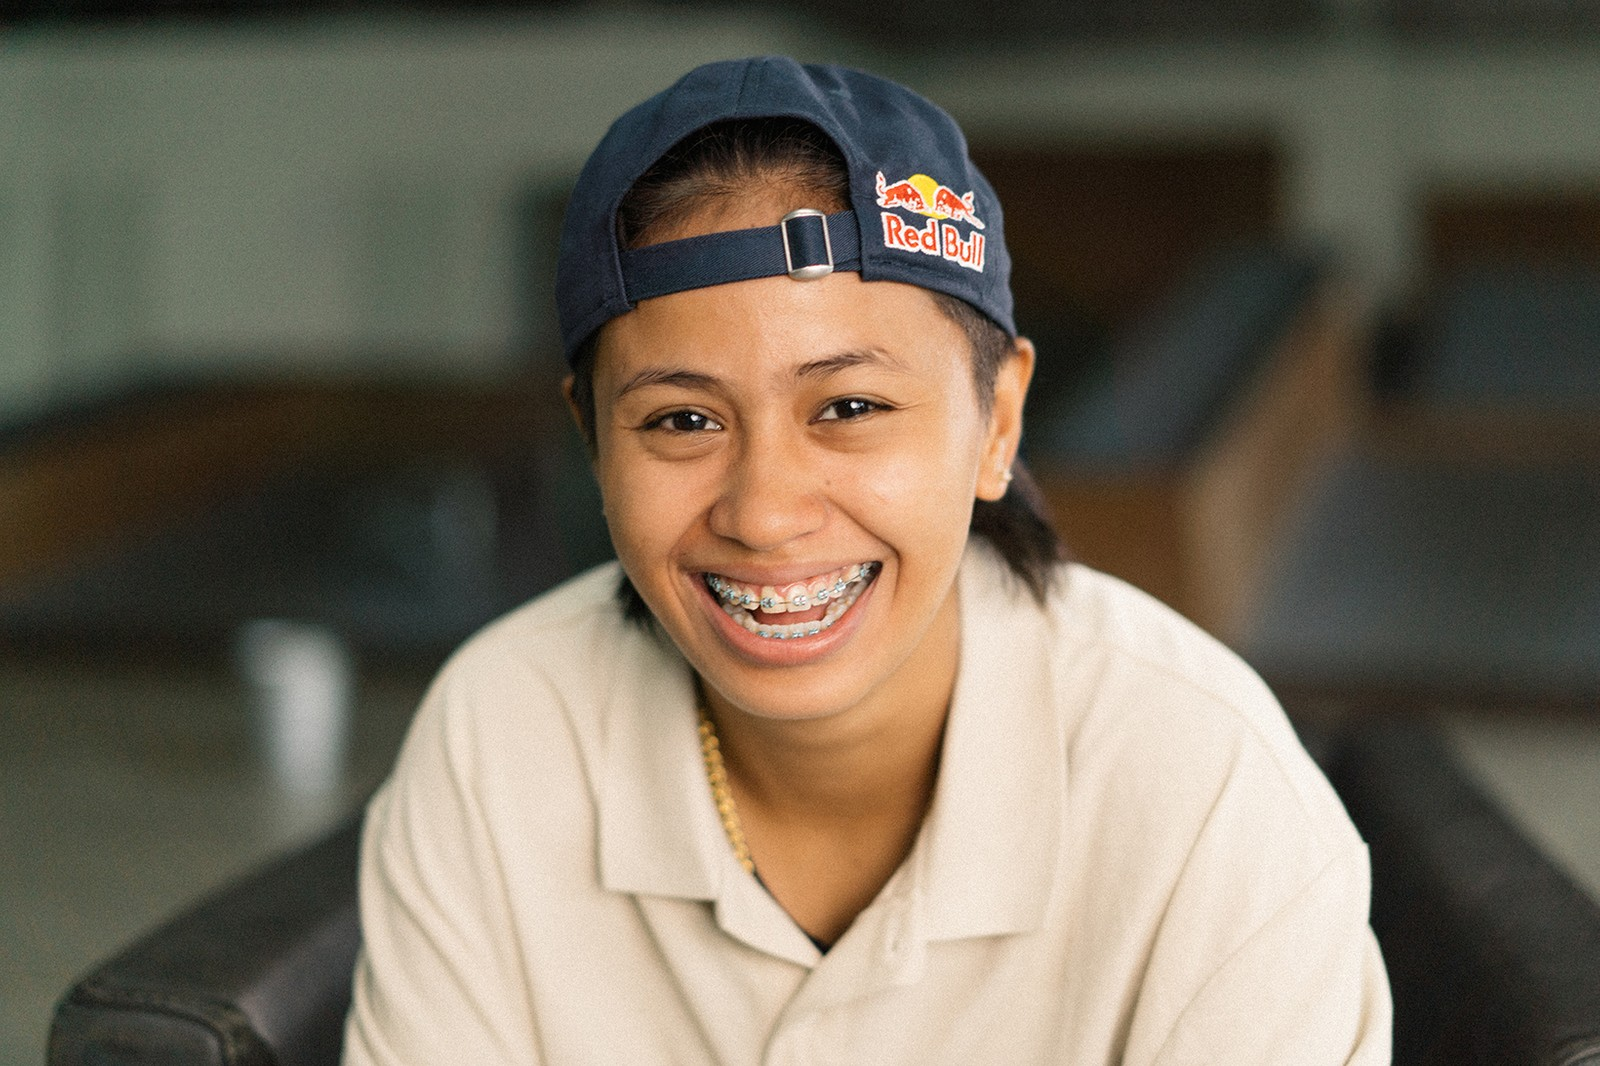 Margielyn Didal Margie Filipino Skateboarder Skater Olympian Athlete Tokyo Olympics Women's Street New Balance Numerics Red Bull Cap